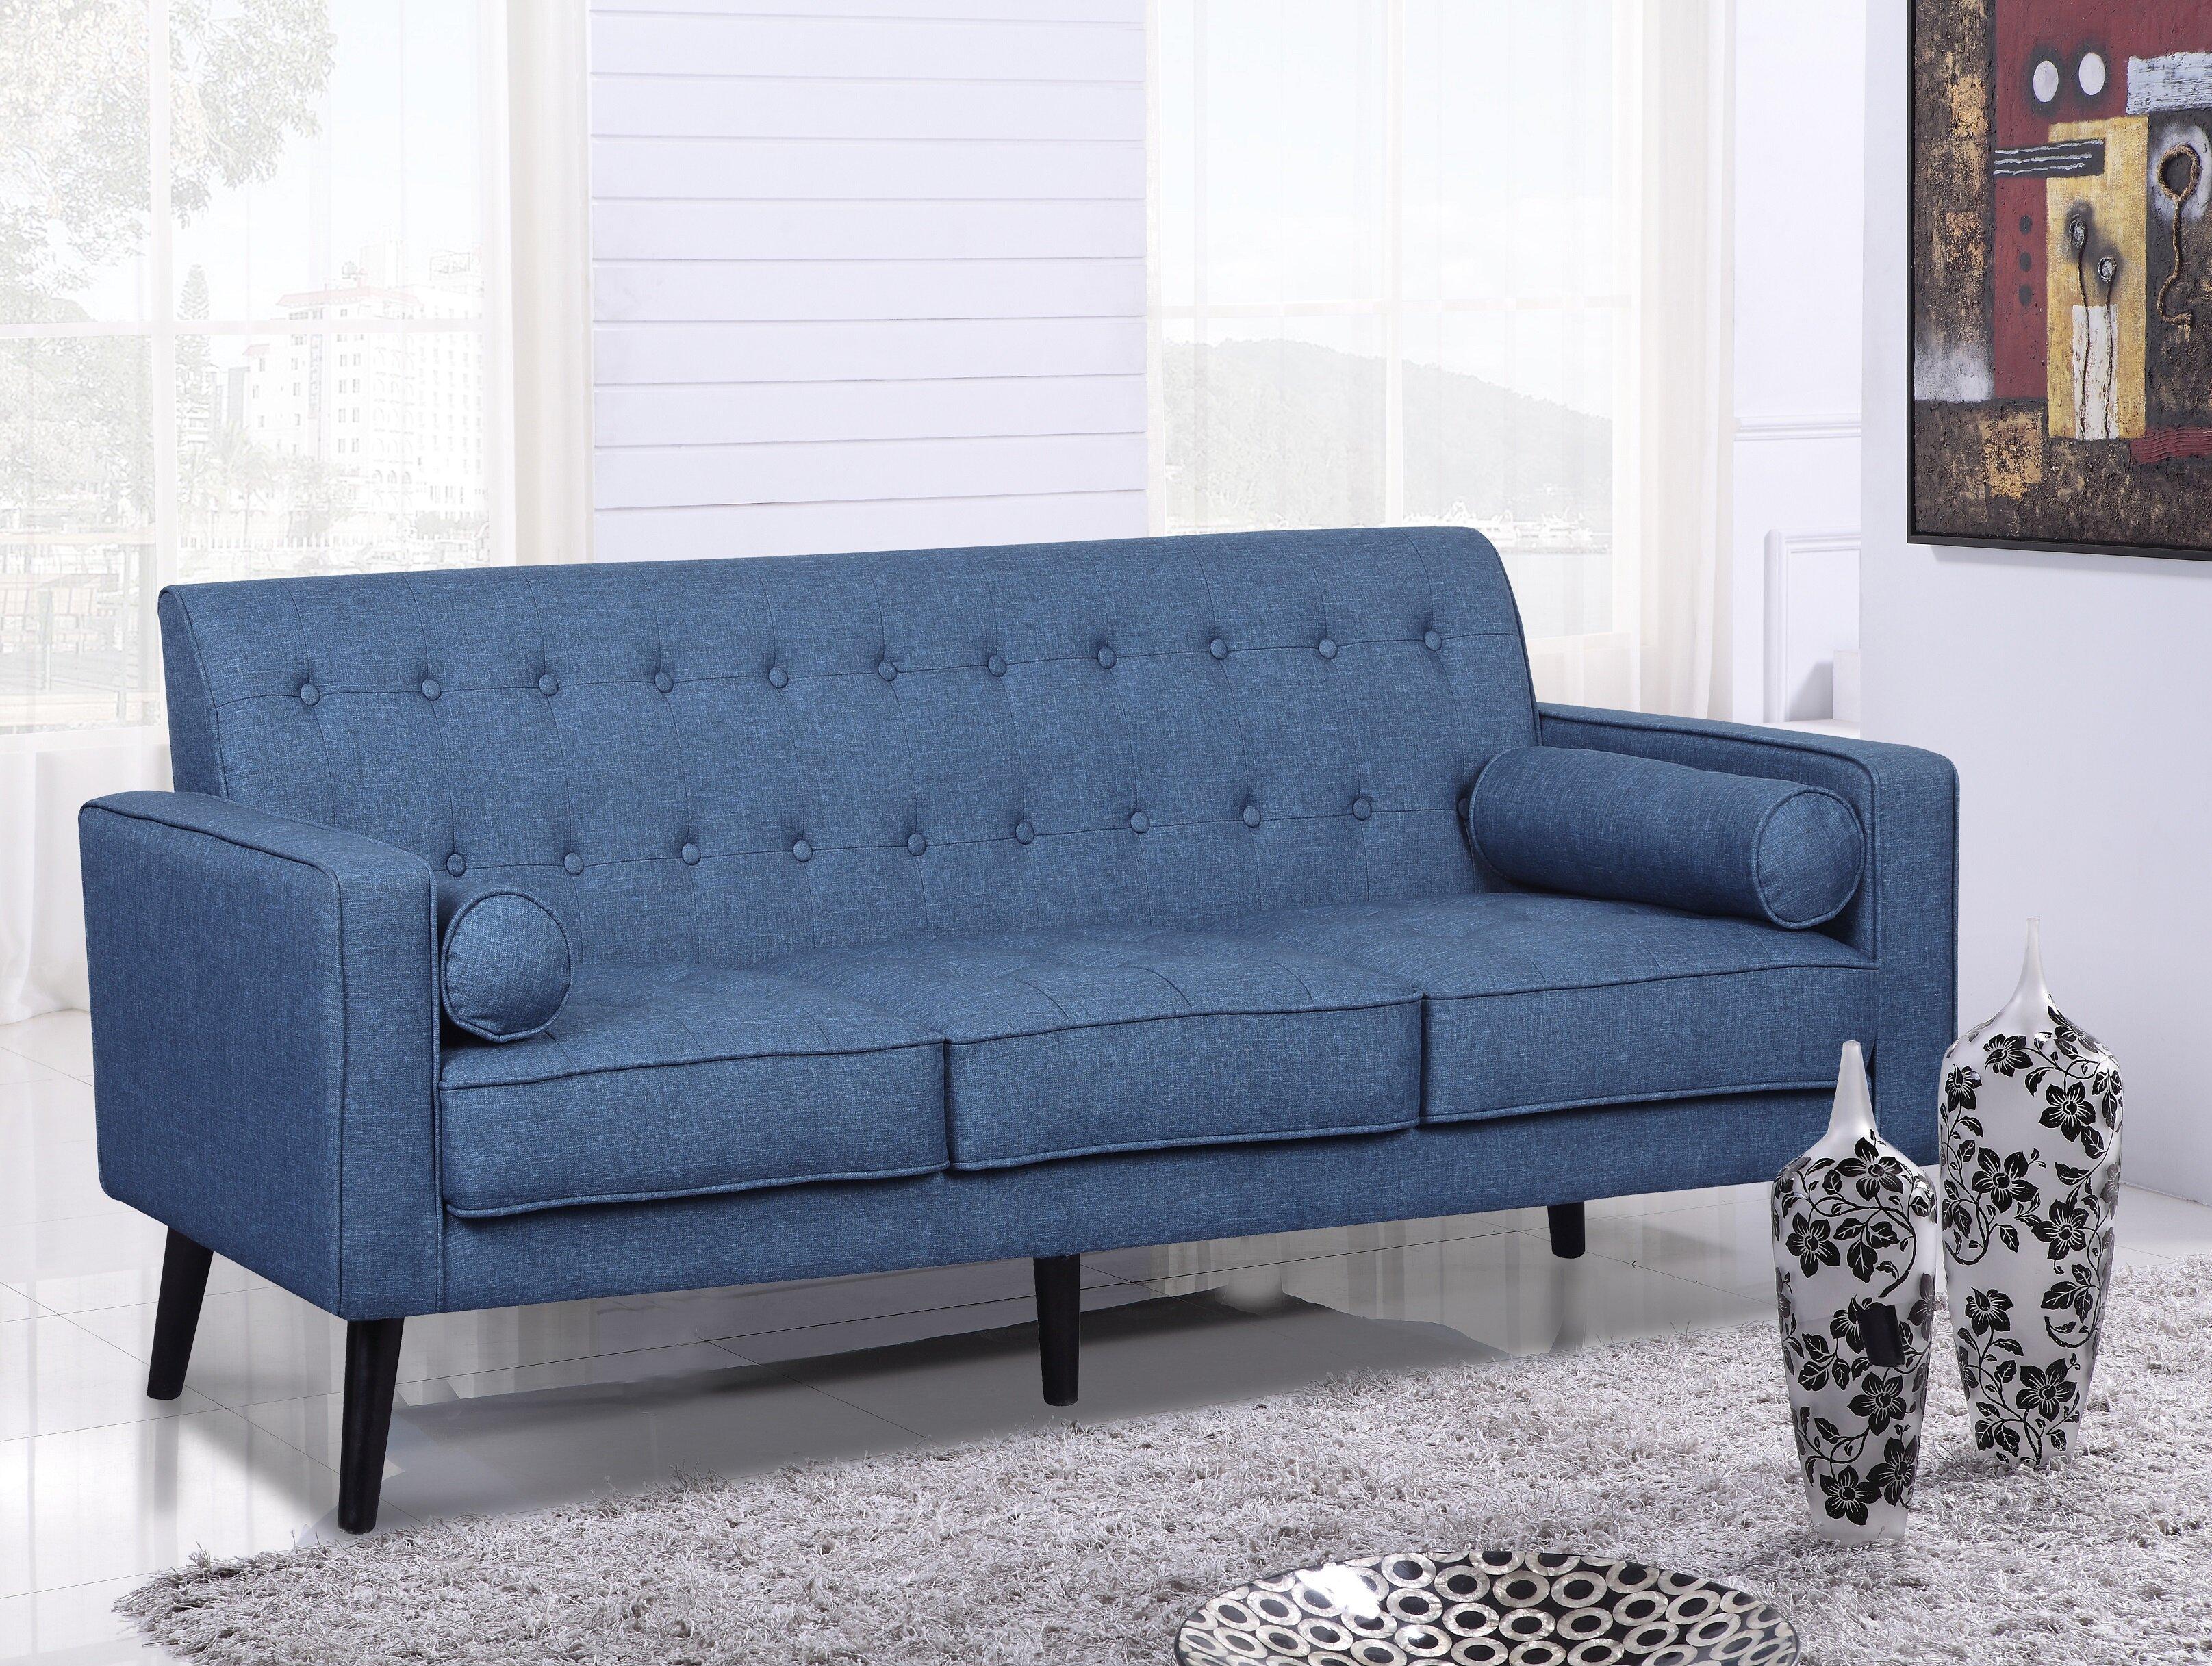 Deven Mid Century Tufted Sofa